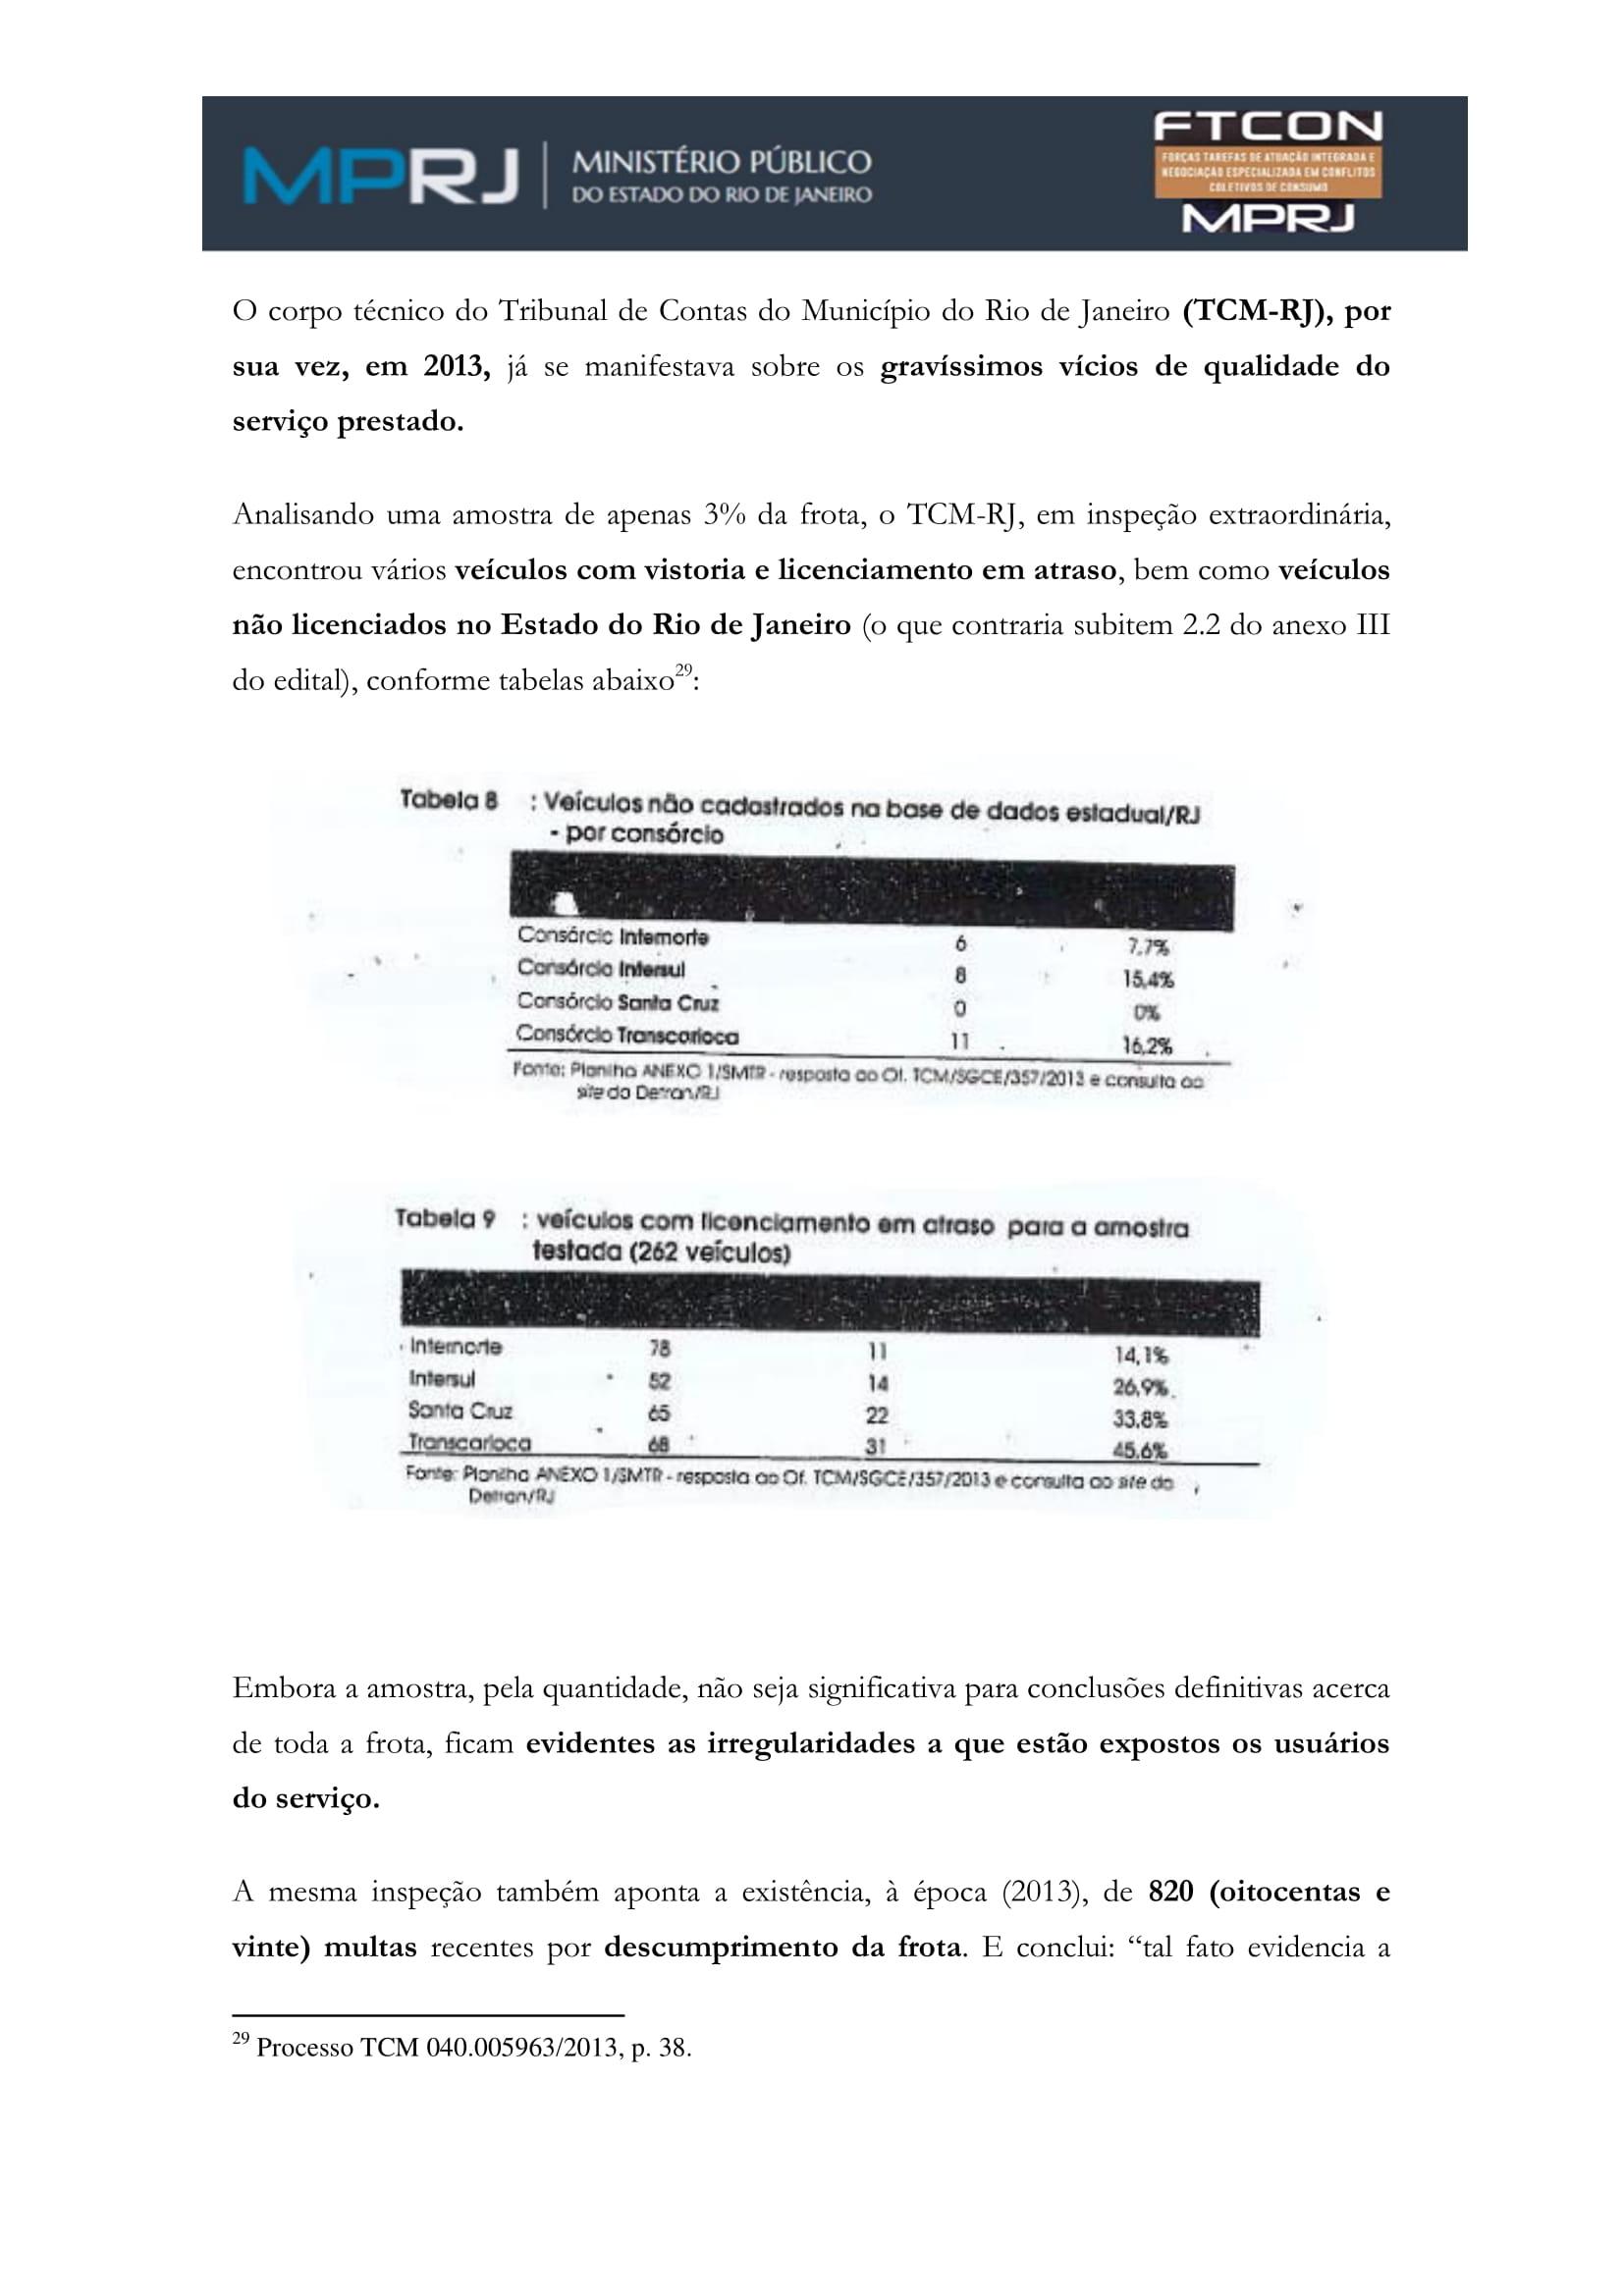 acp_caducidade_onibus_dr_rt-030